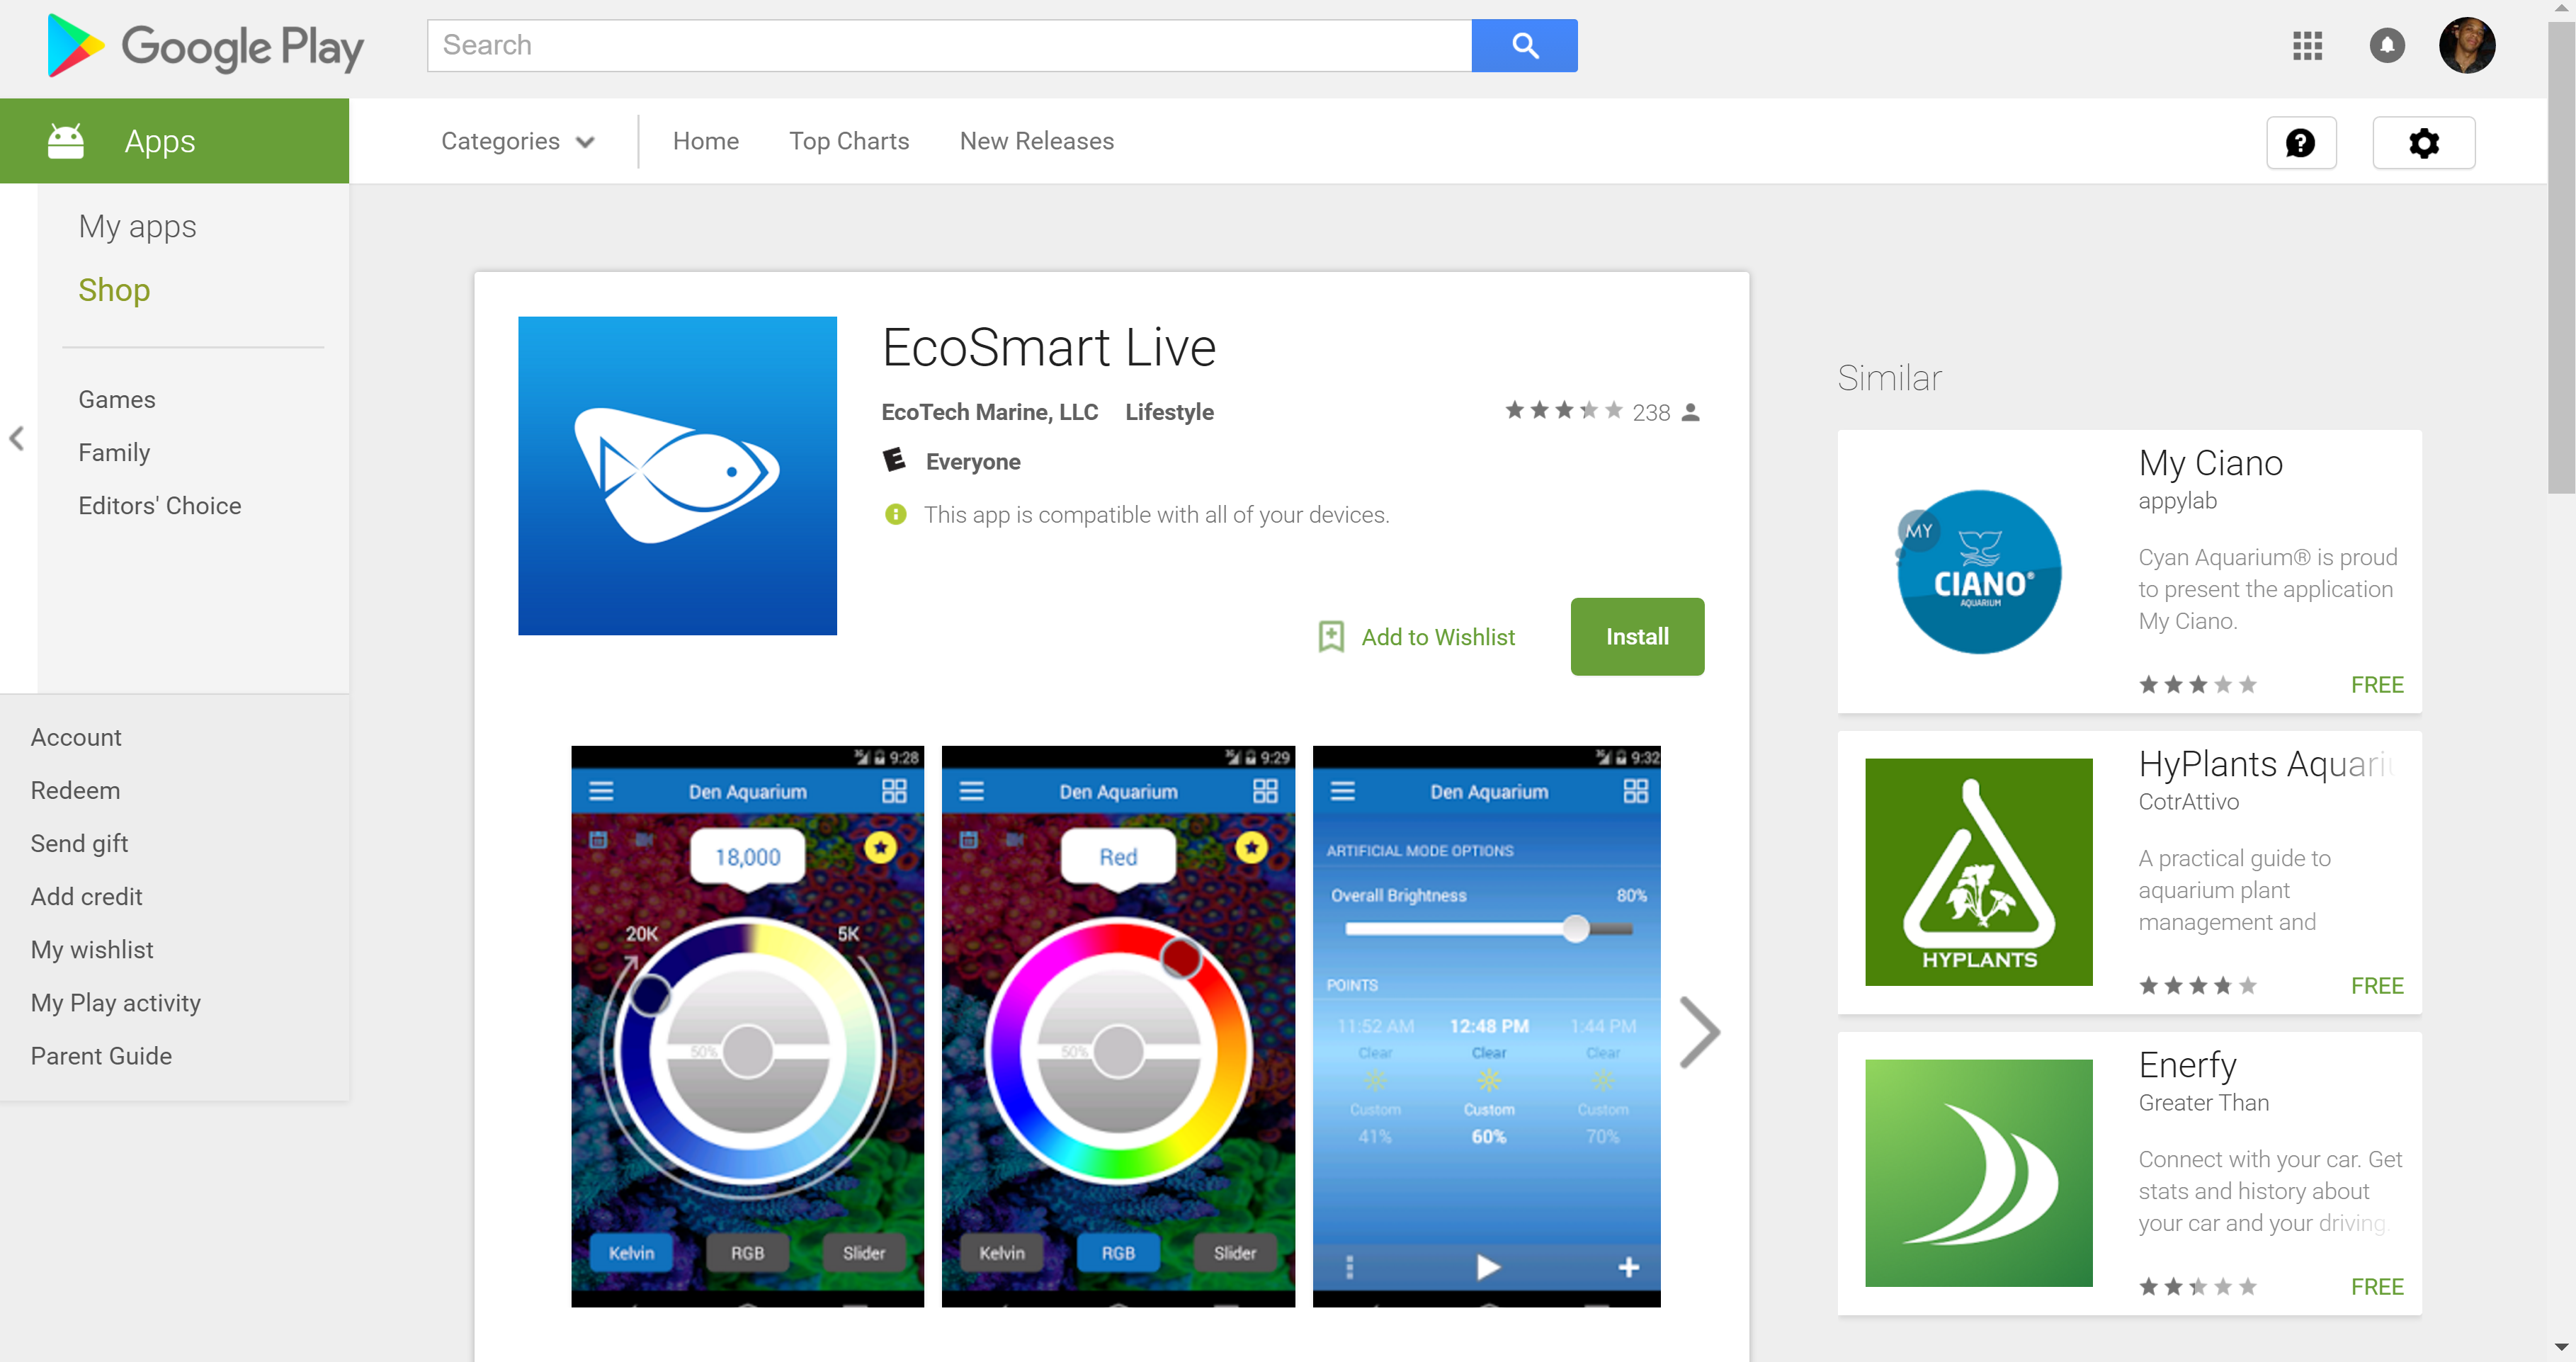 EcoSmart Live